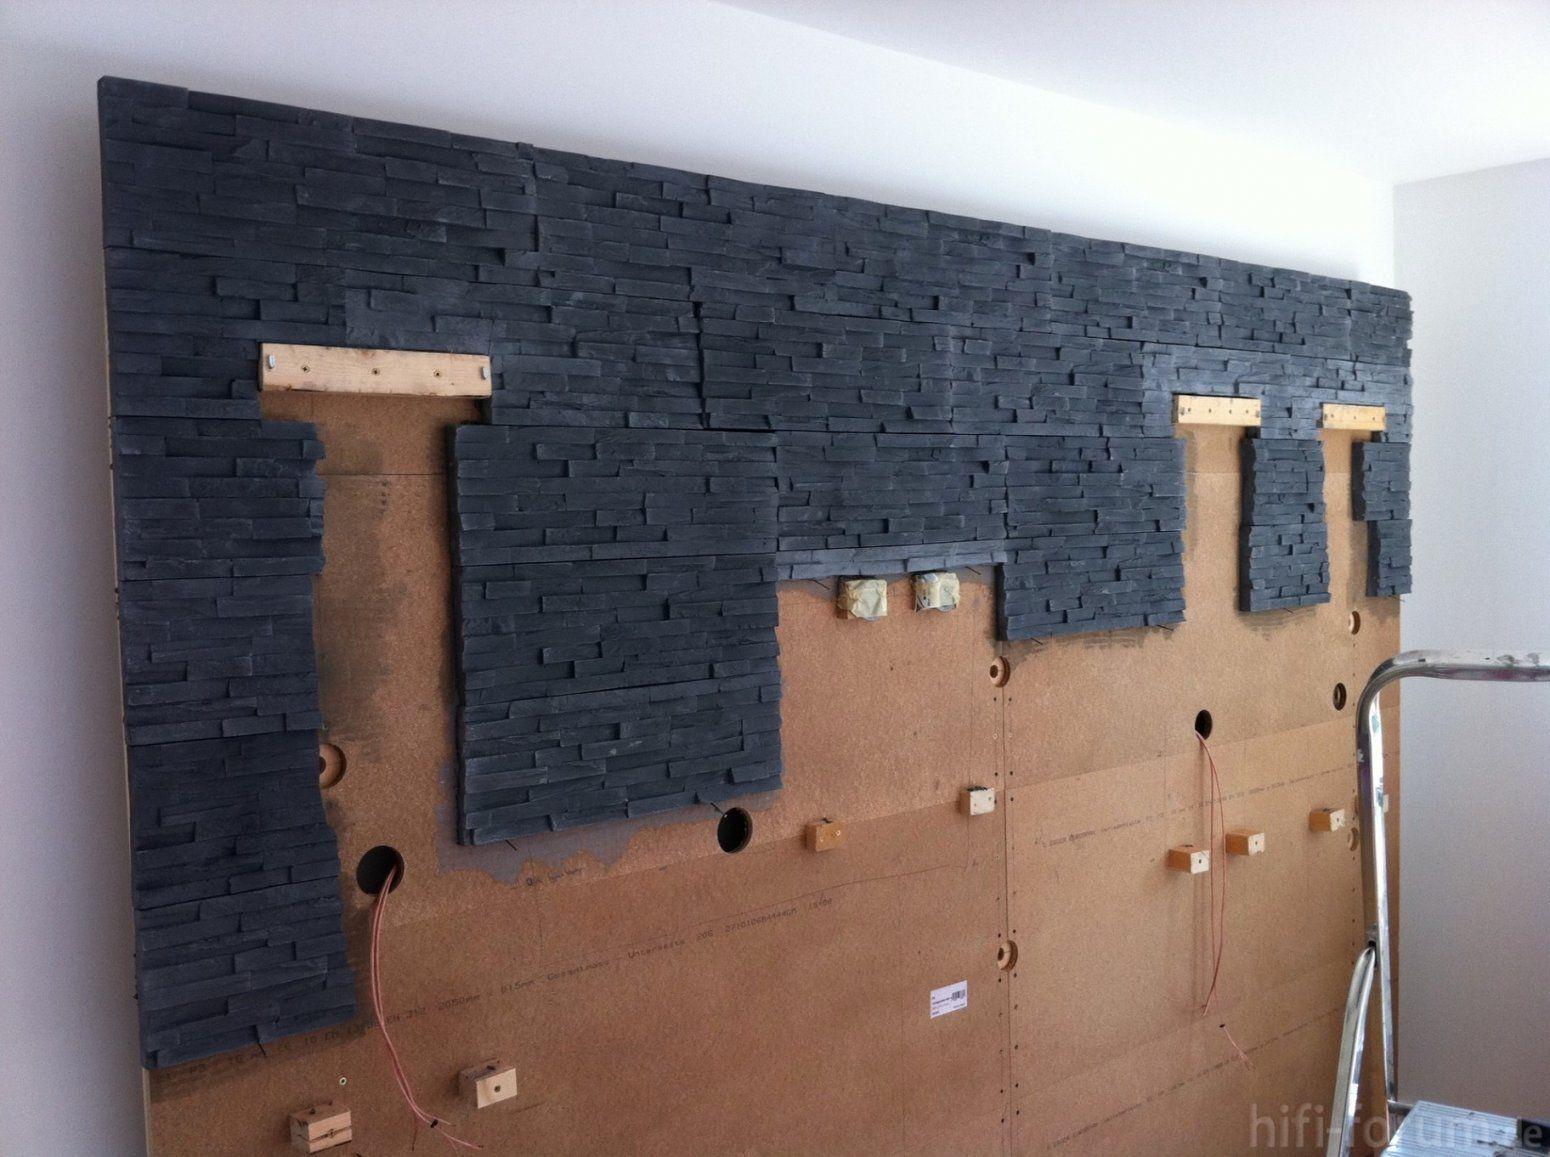 Wohnideen  Hifi Wand Selber Bauen Mit Neu Wohnwand Selber Bauen von Hifi Wand Selber Bauen Photo